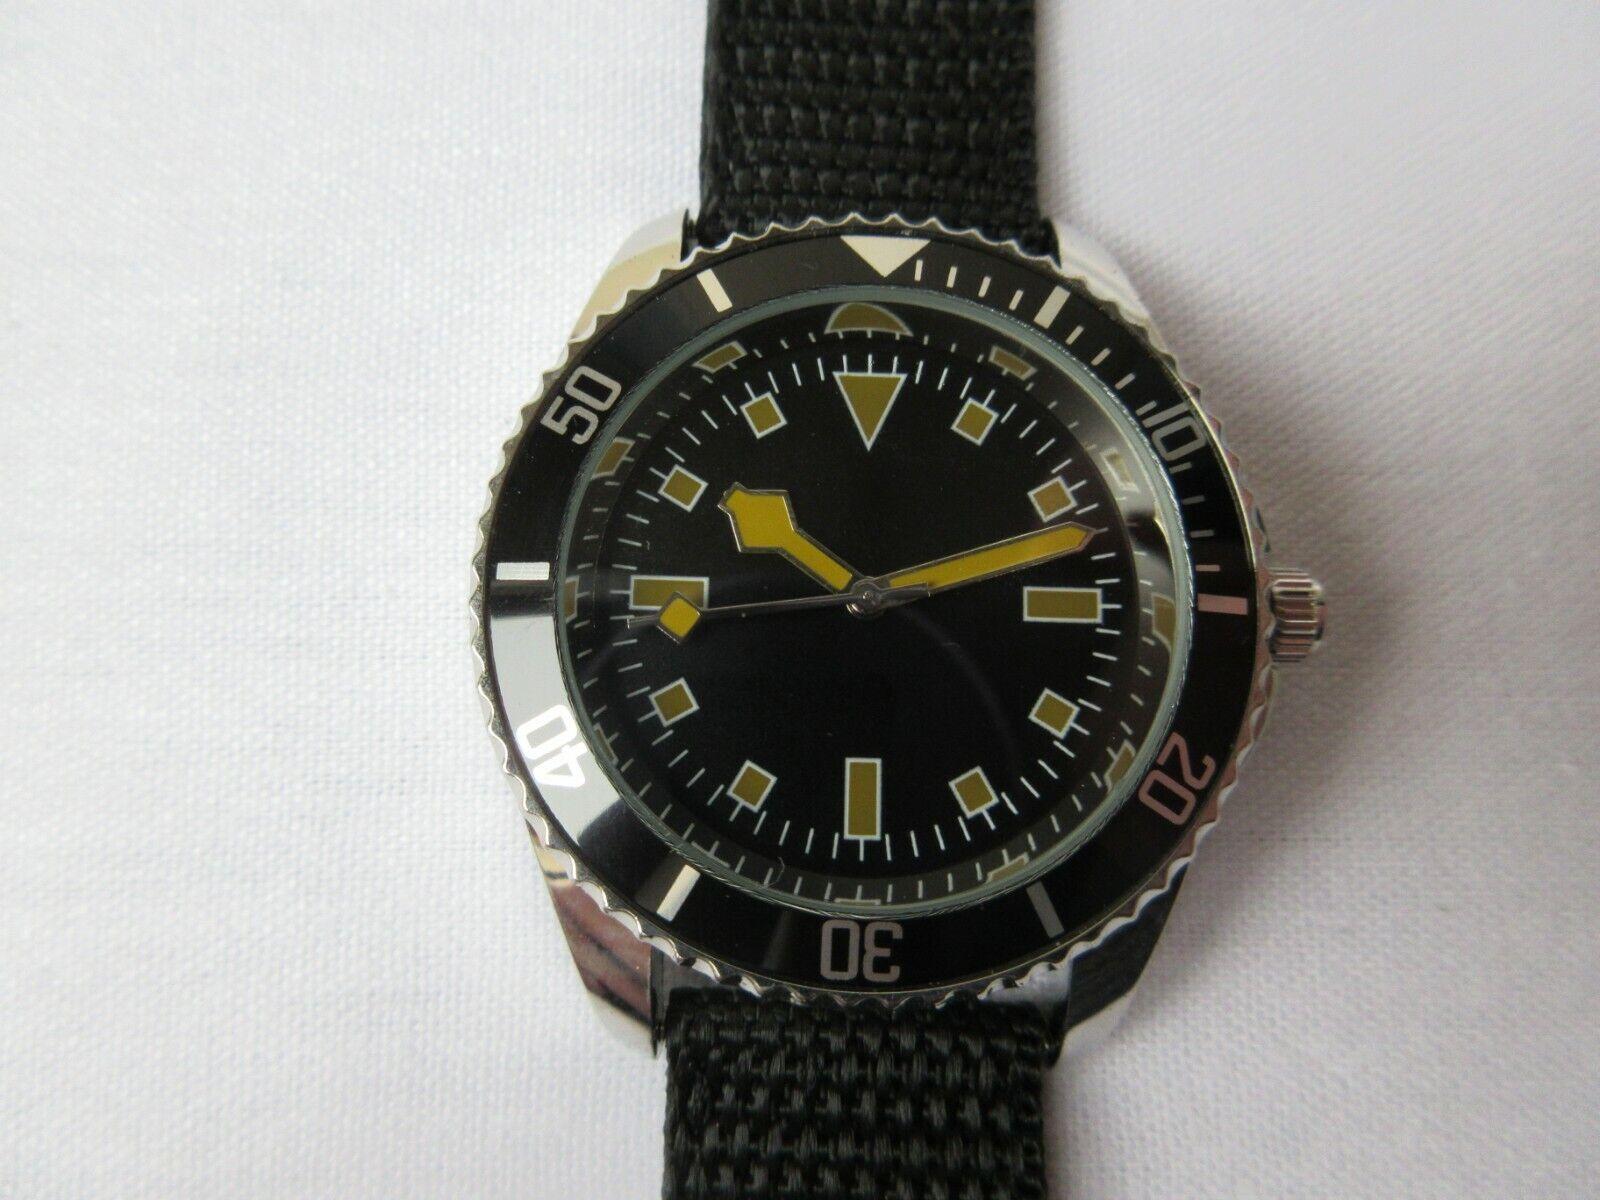 Eaglemoss Replica Military watch: South African Seaman 1970s